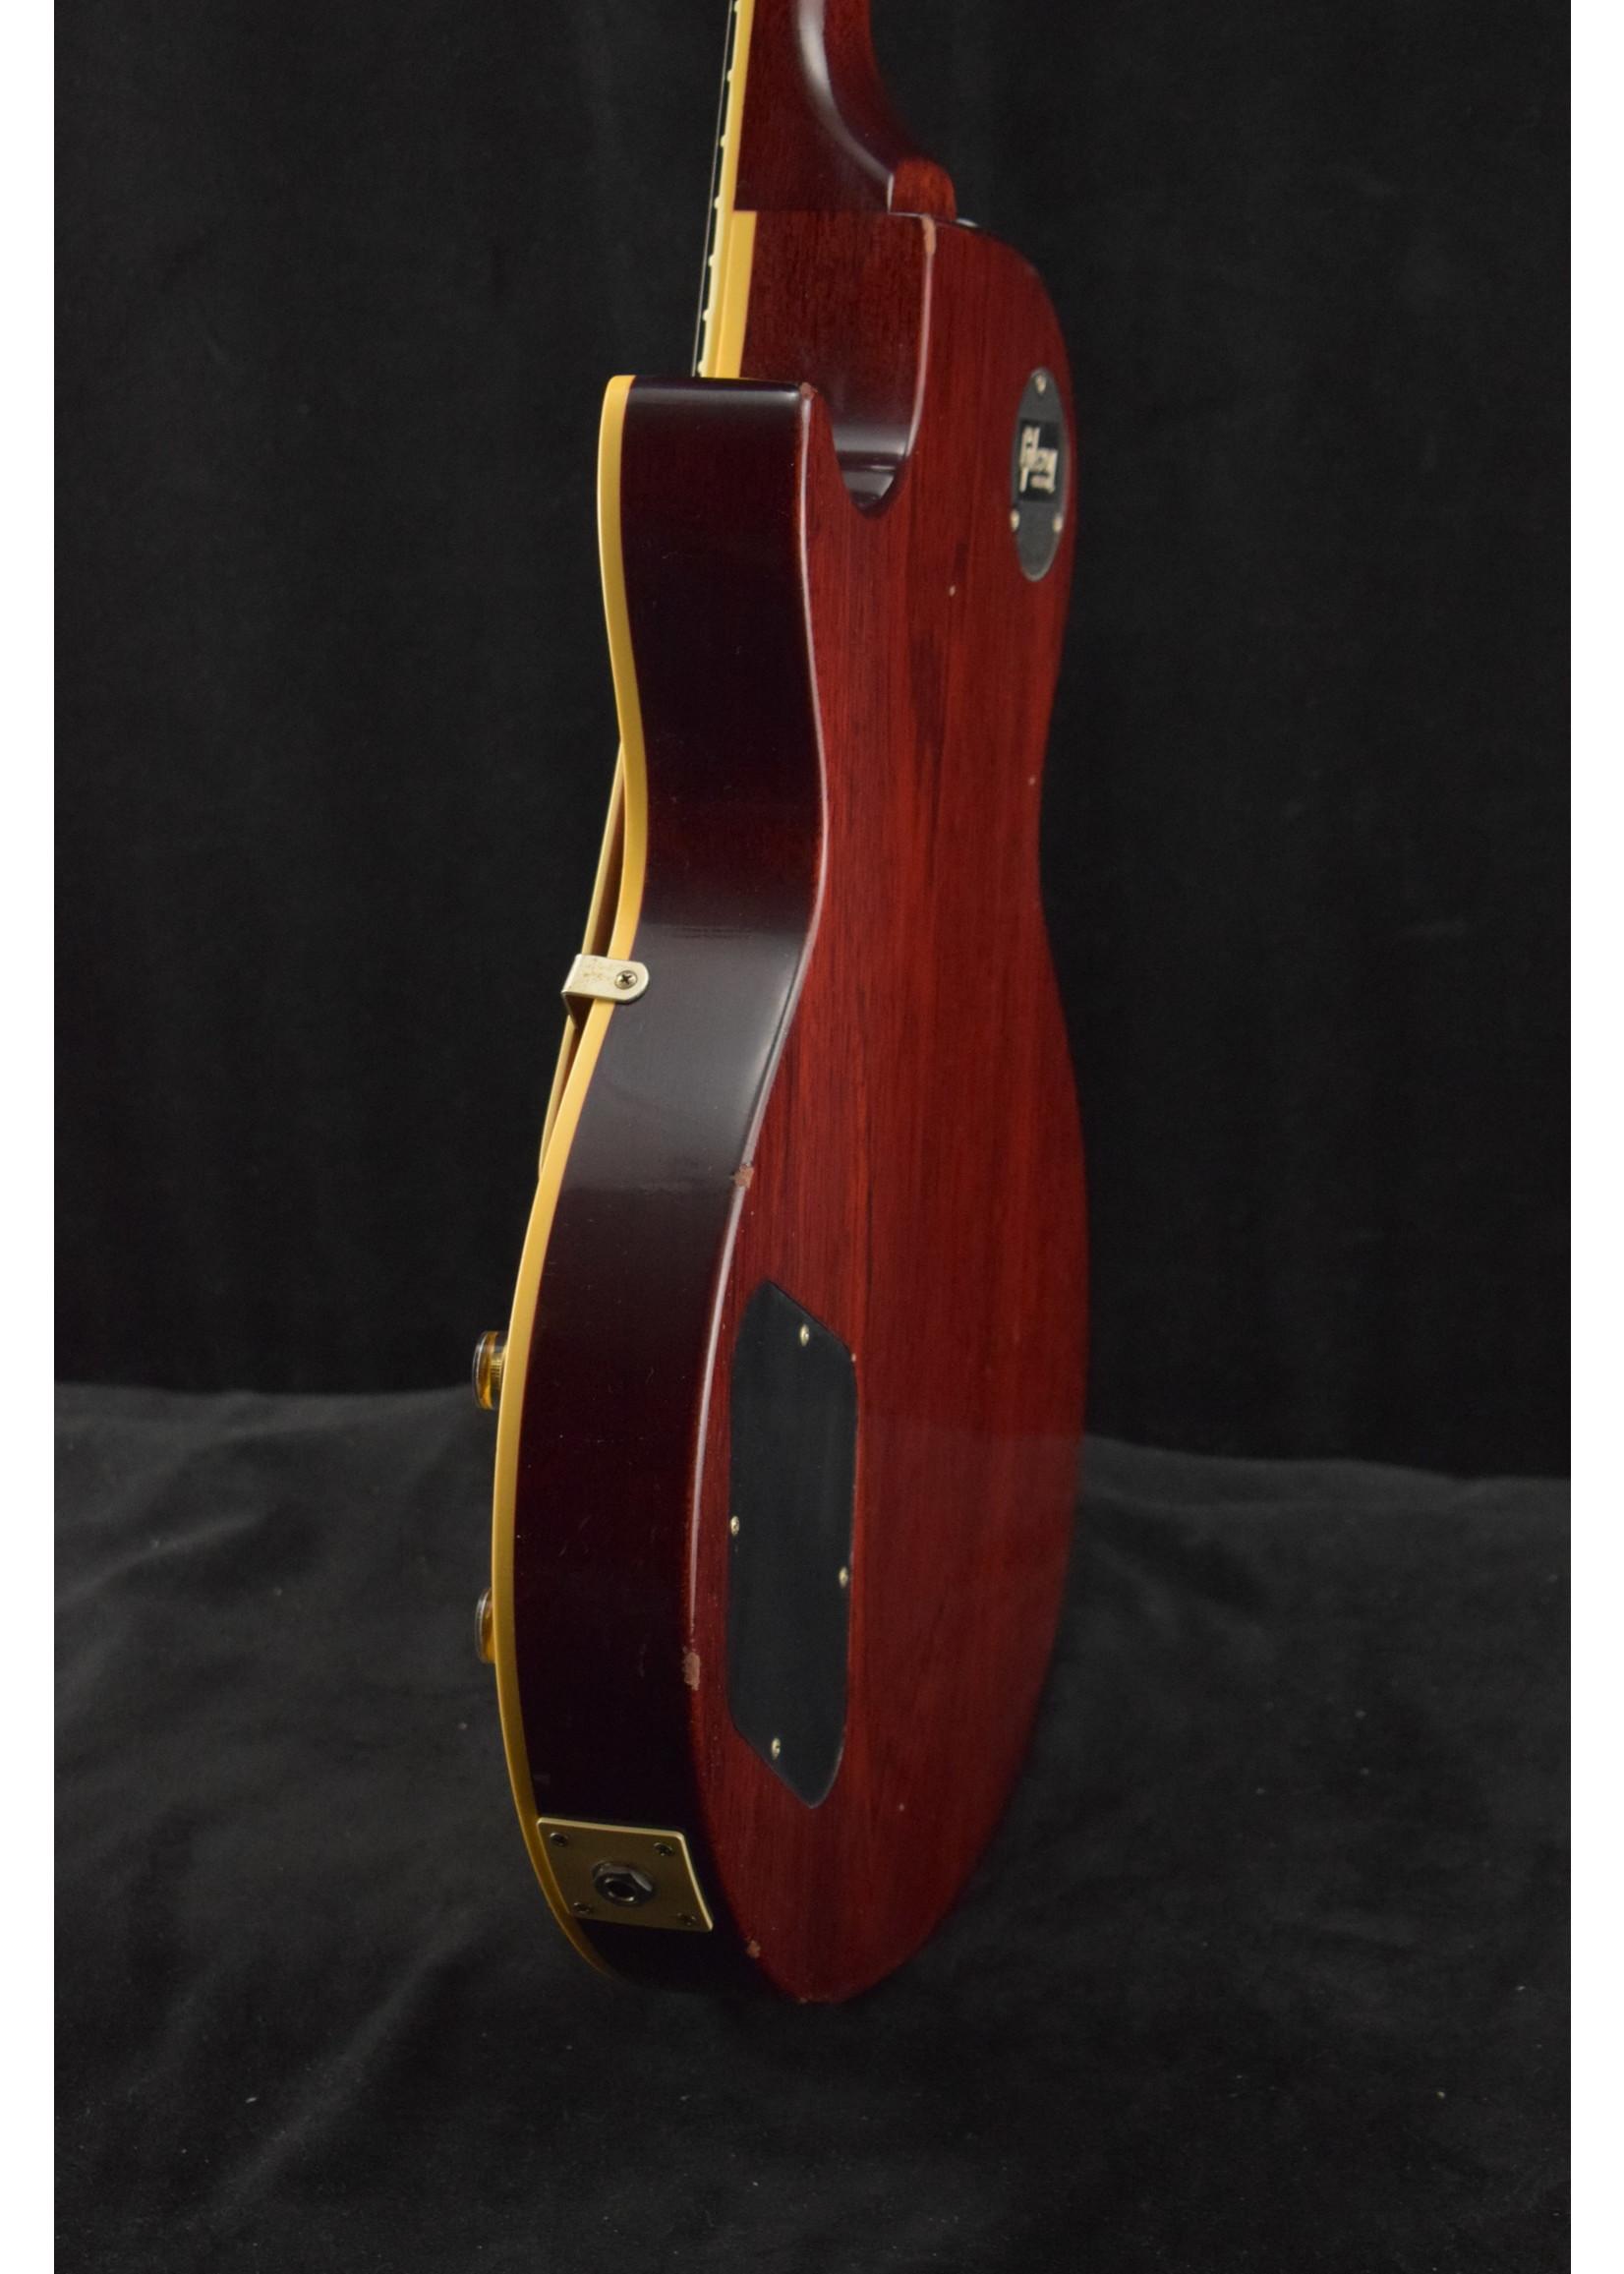 Gibson Gibson Murphy Lab 1960 Les Paul Standard Tomato Soup Burst Light Aged